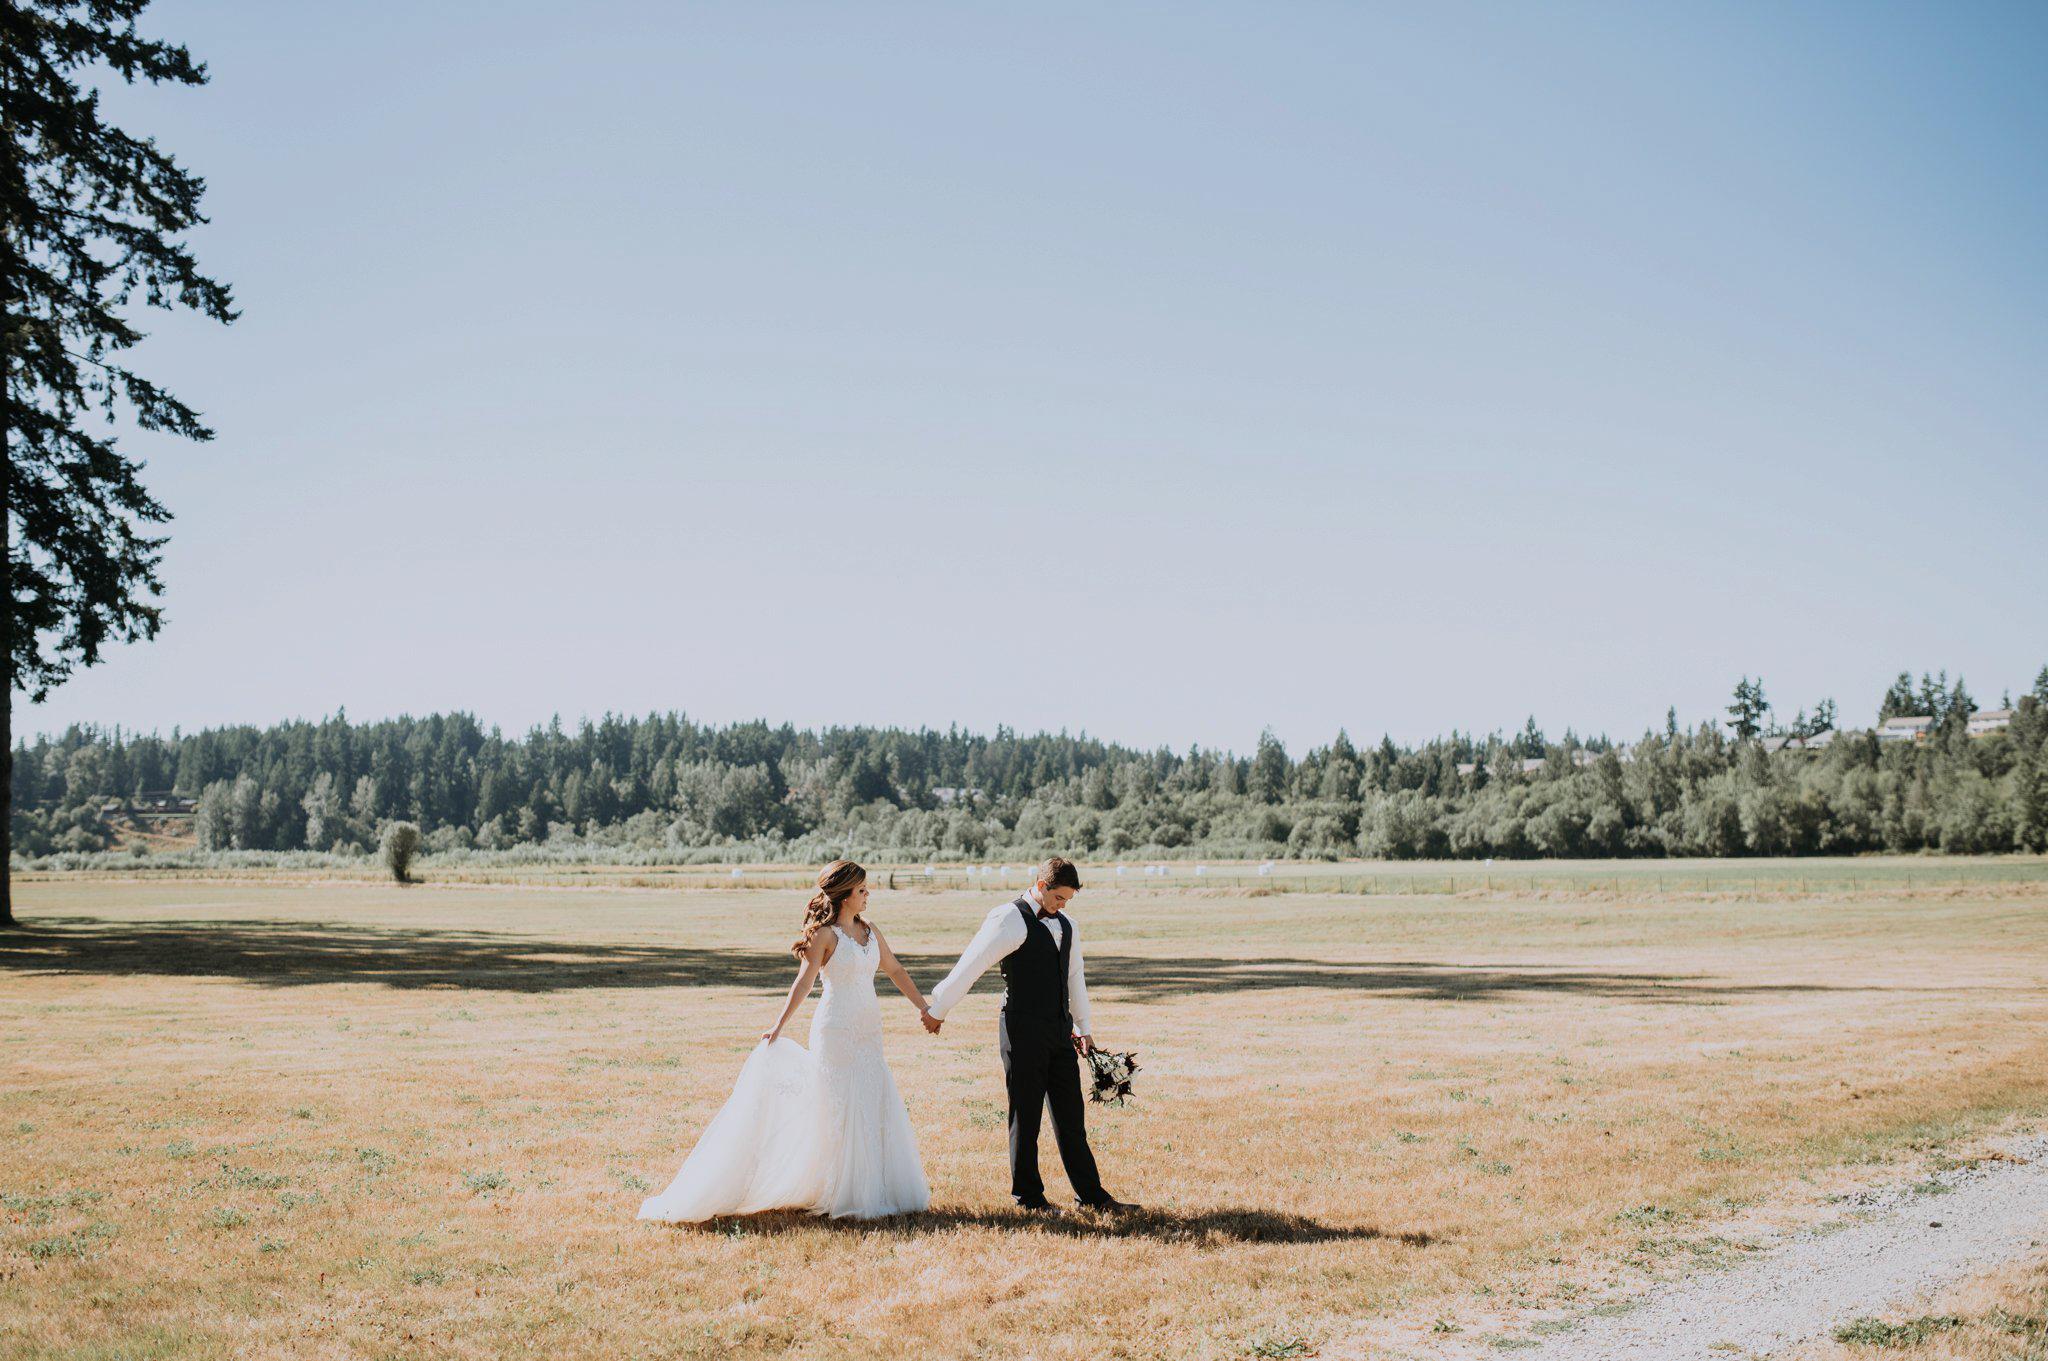 kristen-and-cody-the-kelley-farm-wedding-seattle-photographer-caitlyn-nikula-52.jpg